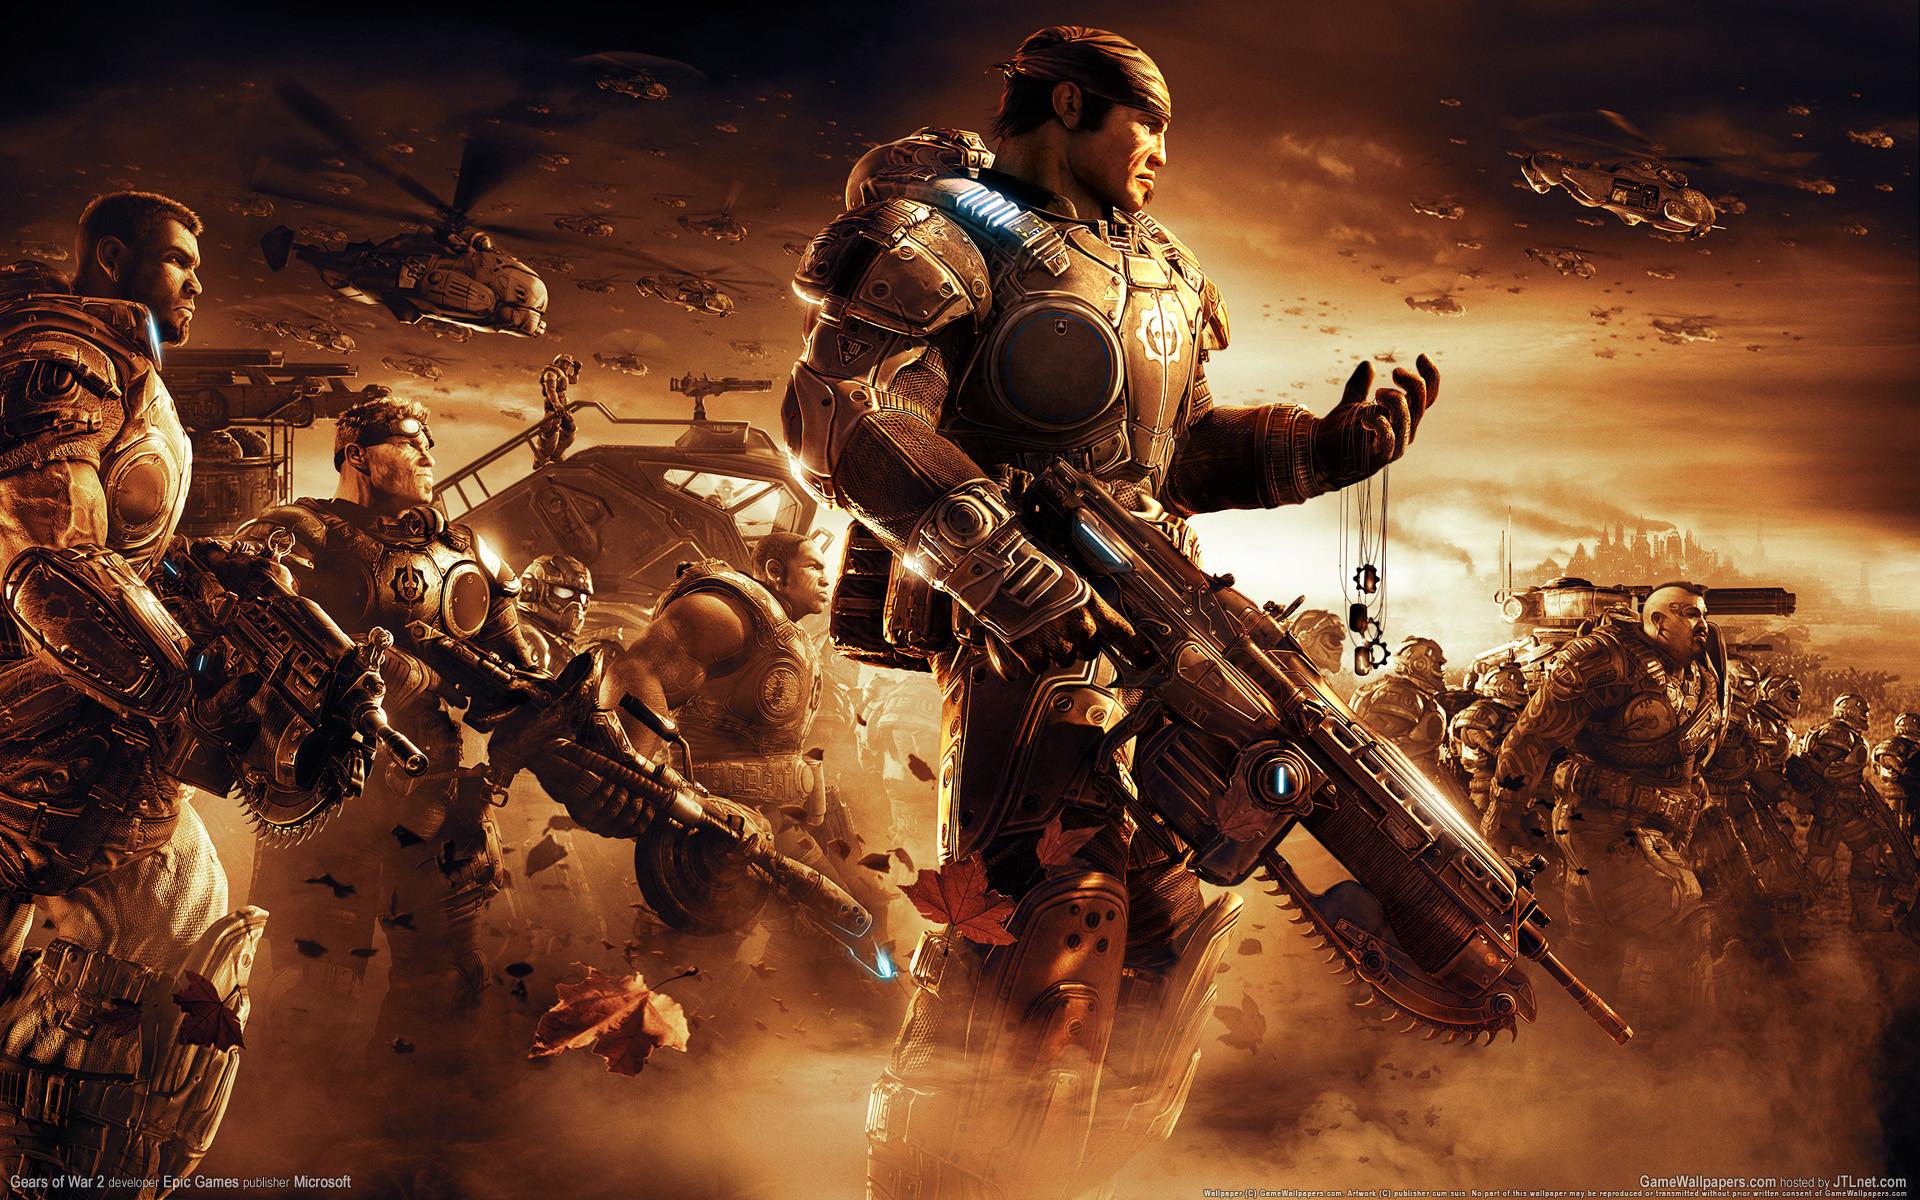 Awesome Gamer Desktop Background · Gears of War Desktop Wallpaper